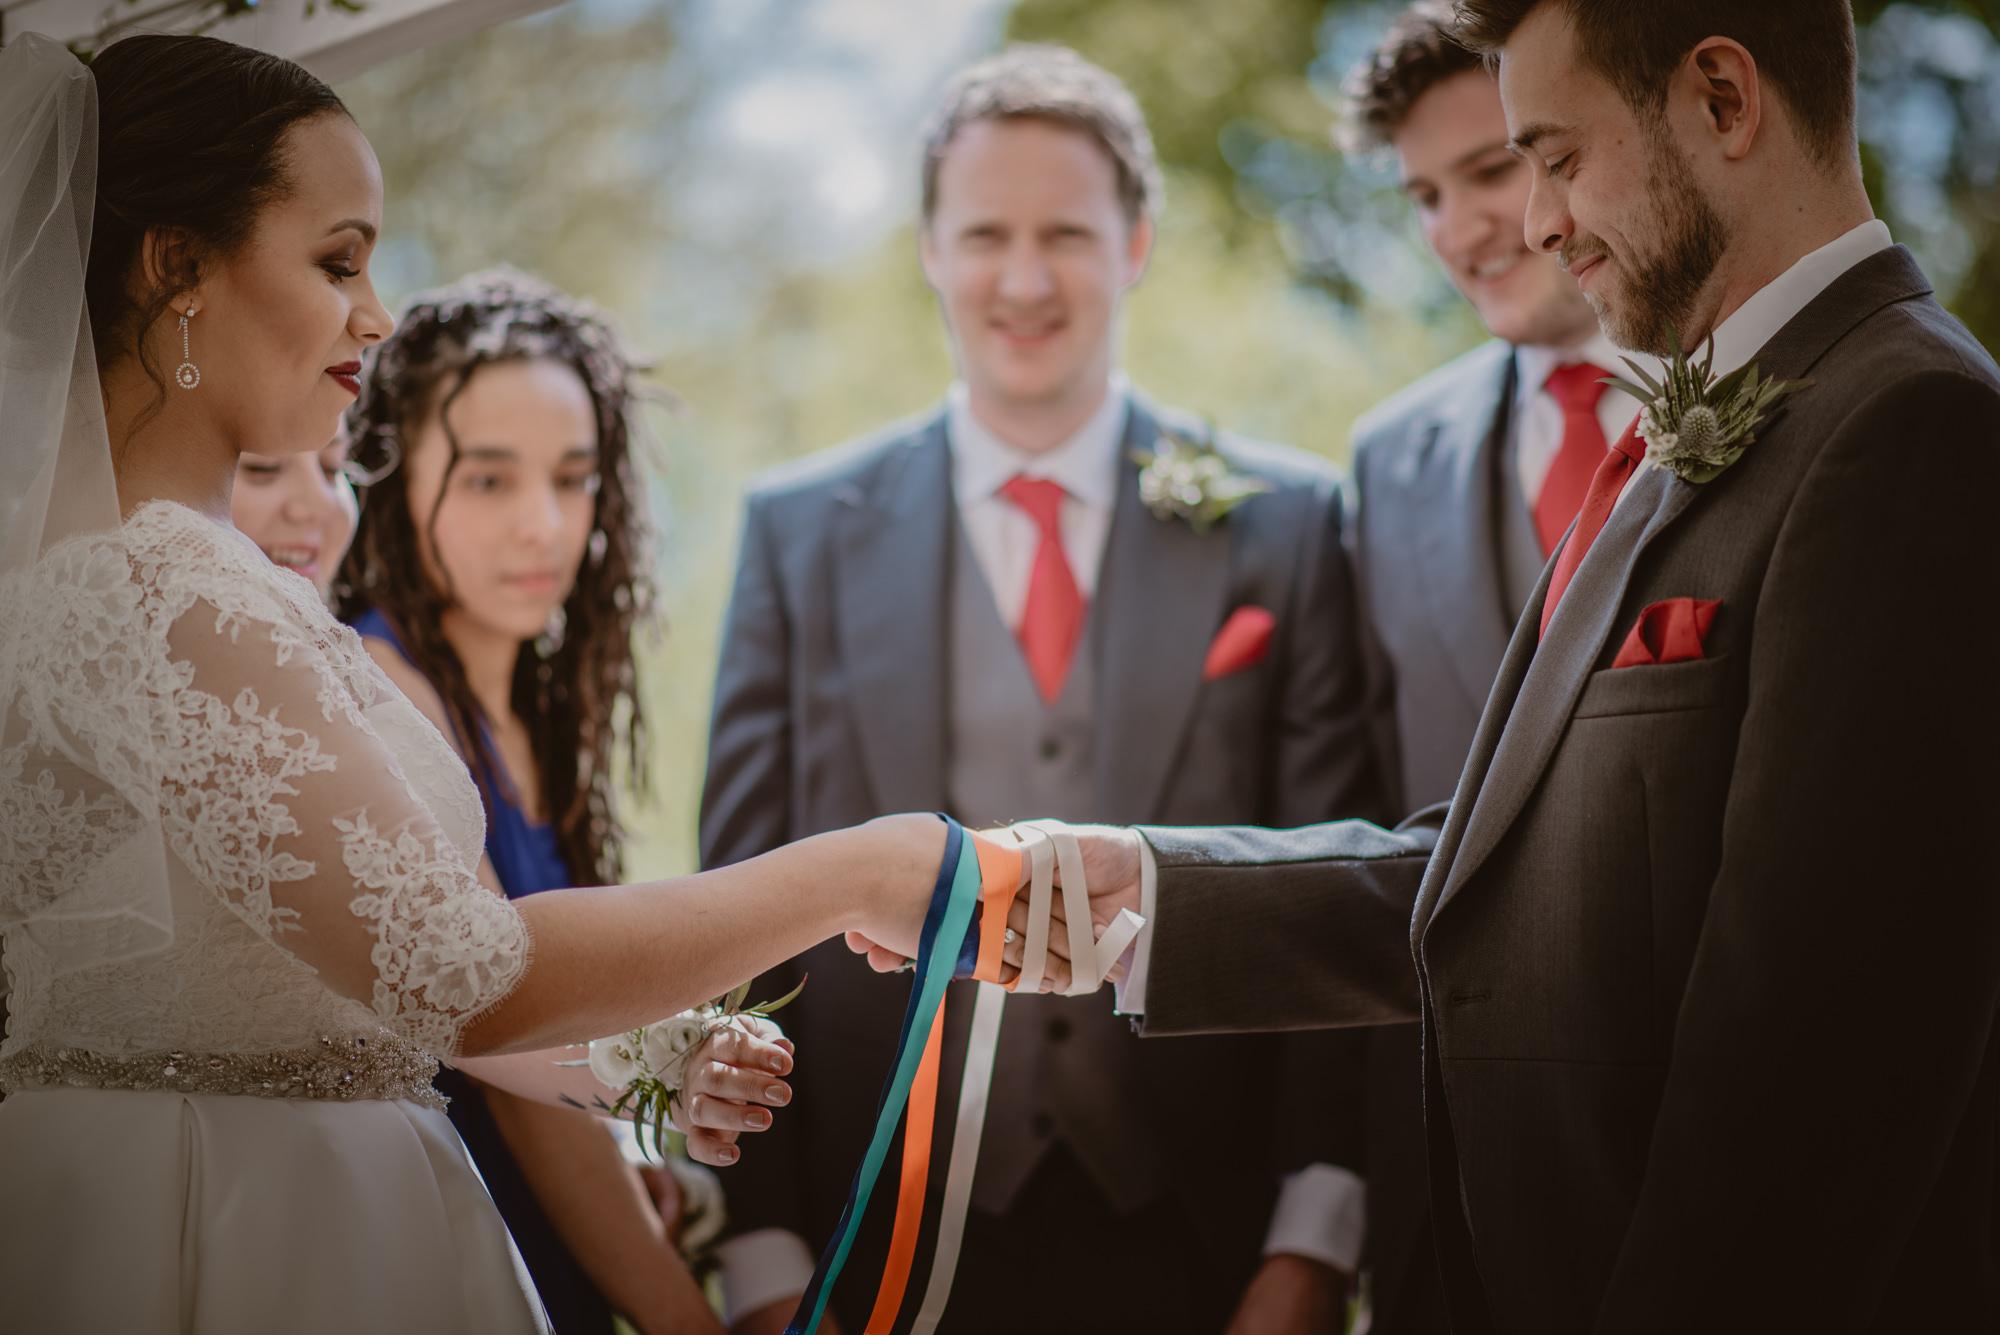 Jacqueline-Gareth-Wedding-Westmead-Events-Surrey-Manu-Mendoza-Wedding-Photography-257.jpg